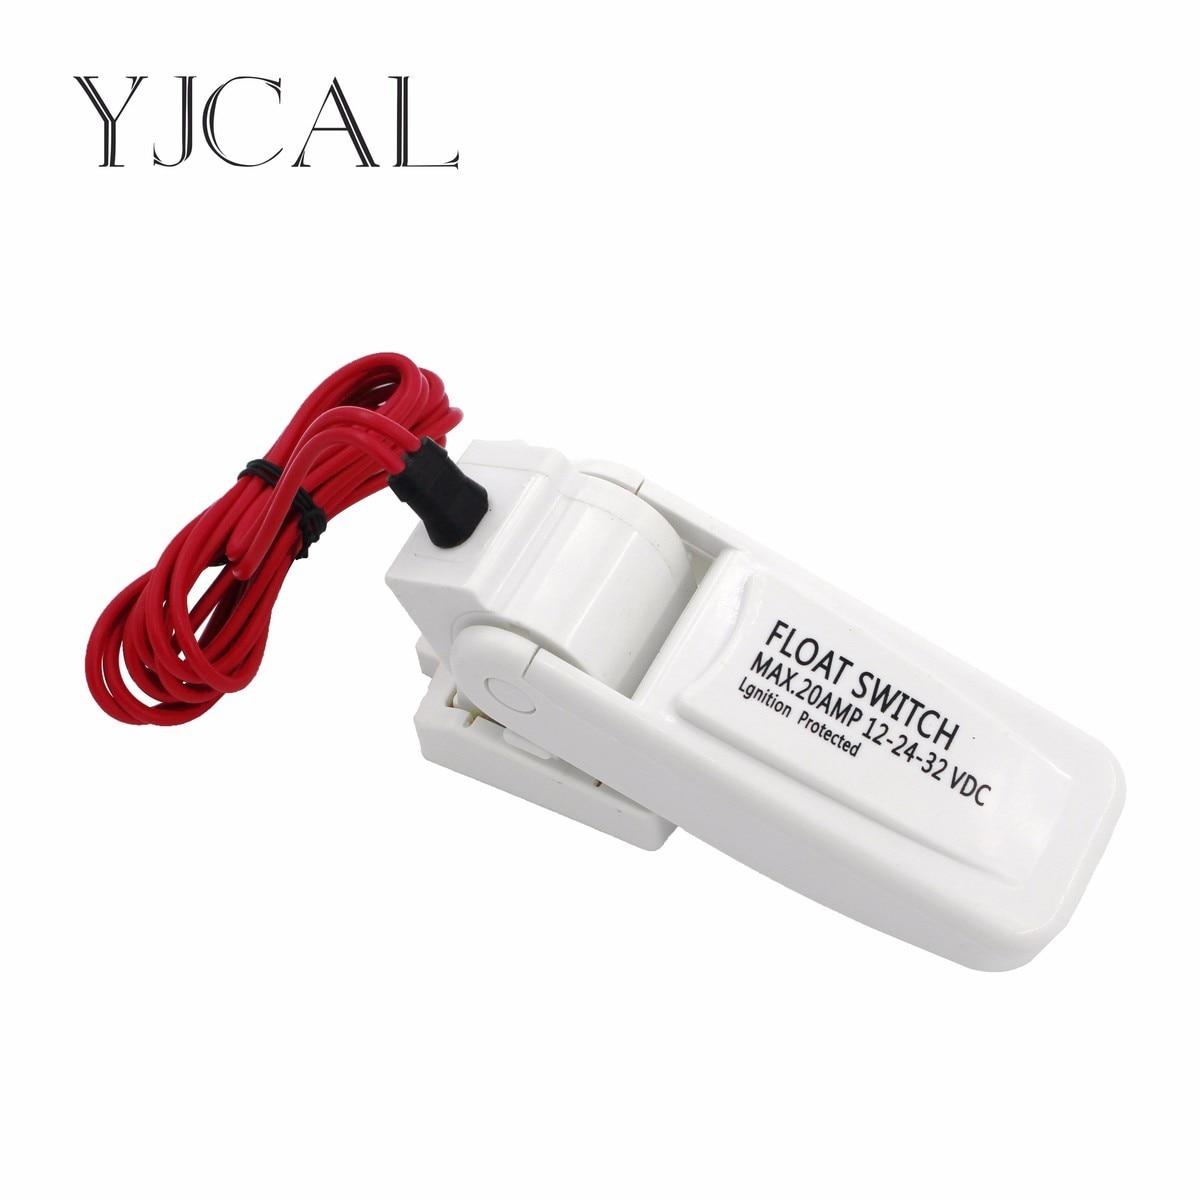 flow sensor automatic electric bilge water pump float switch dc liquid auto toggle level controller 20 amp 12 24 32 vdc [ 1200 x 1200 Pixel ]